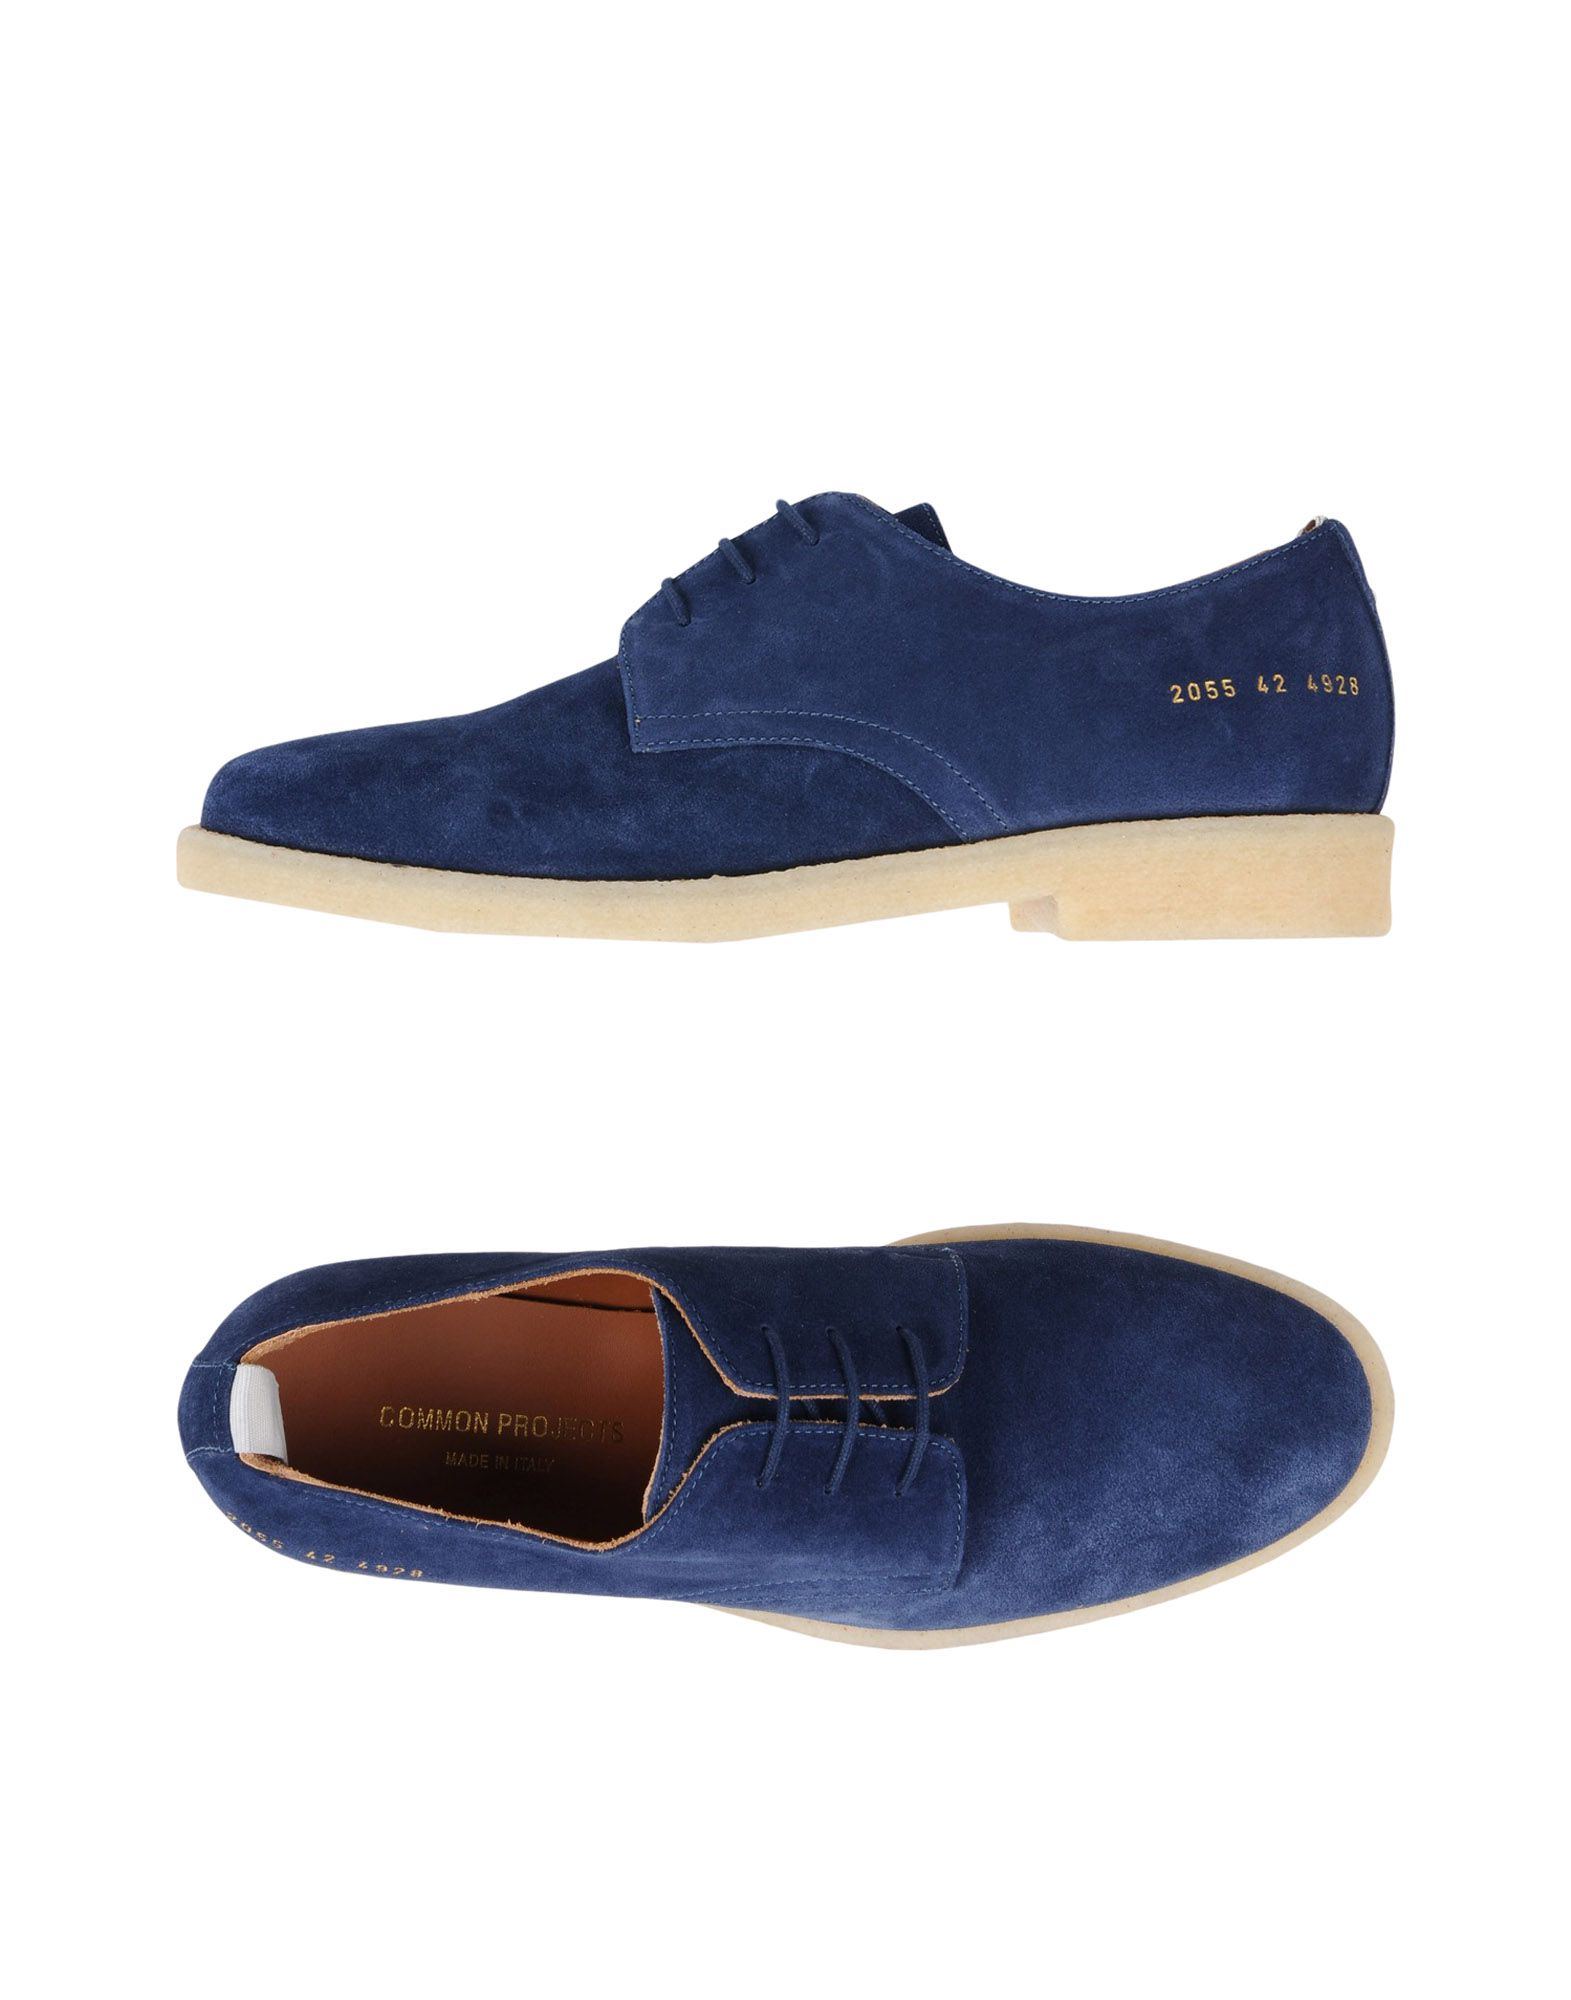 Common Projects Schnürschuhe Herren  11405412AO Gute Qualität beliebte Schuhe